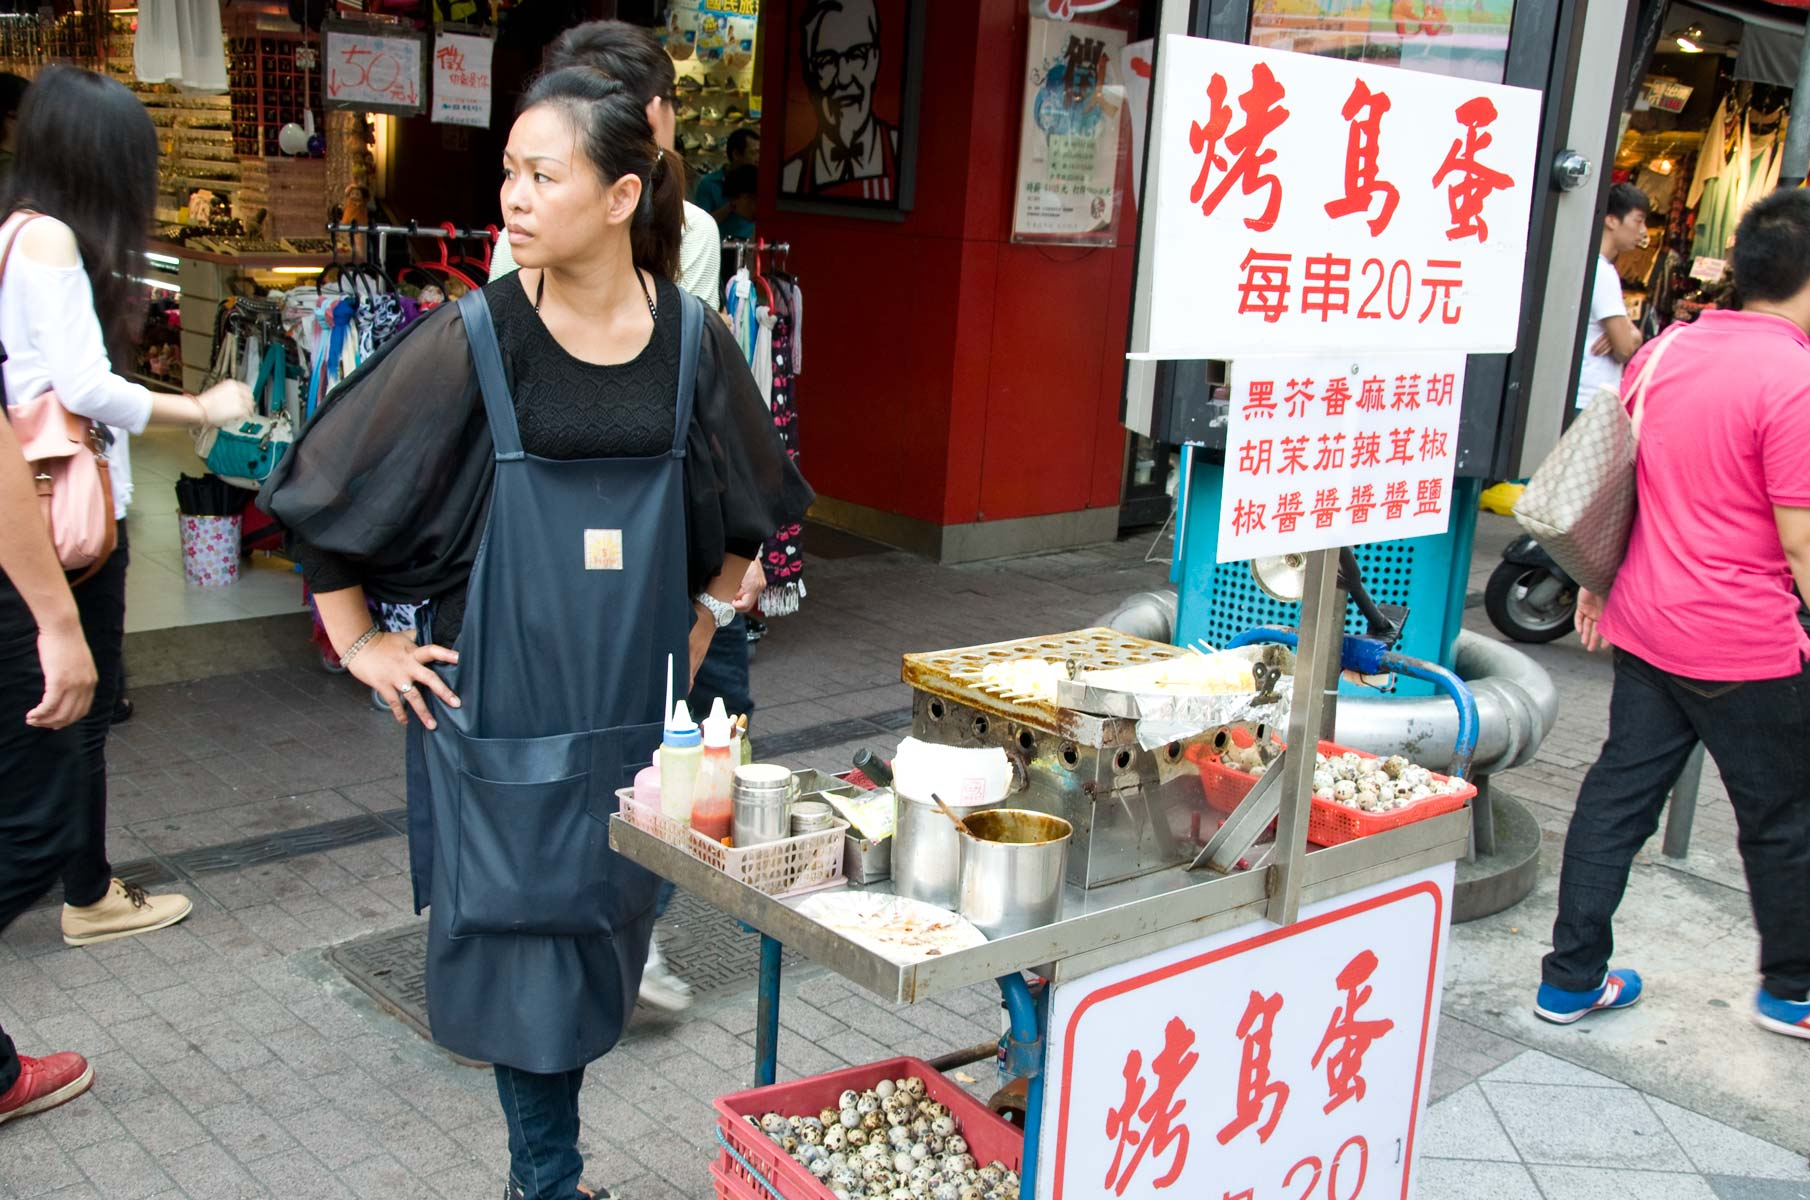 Street Food im Vergnügungsviertel Ximending in Taipei, Taiwan